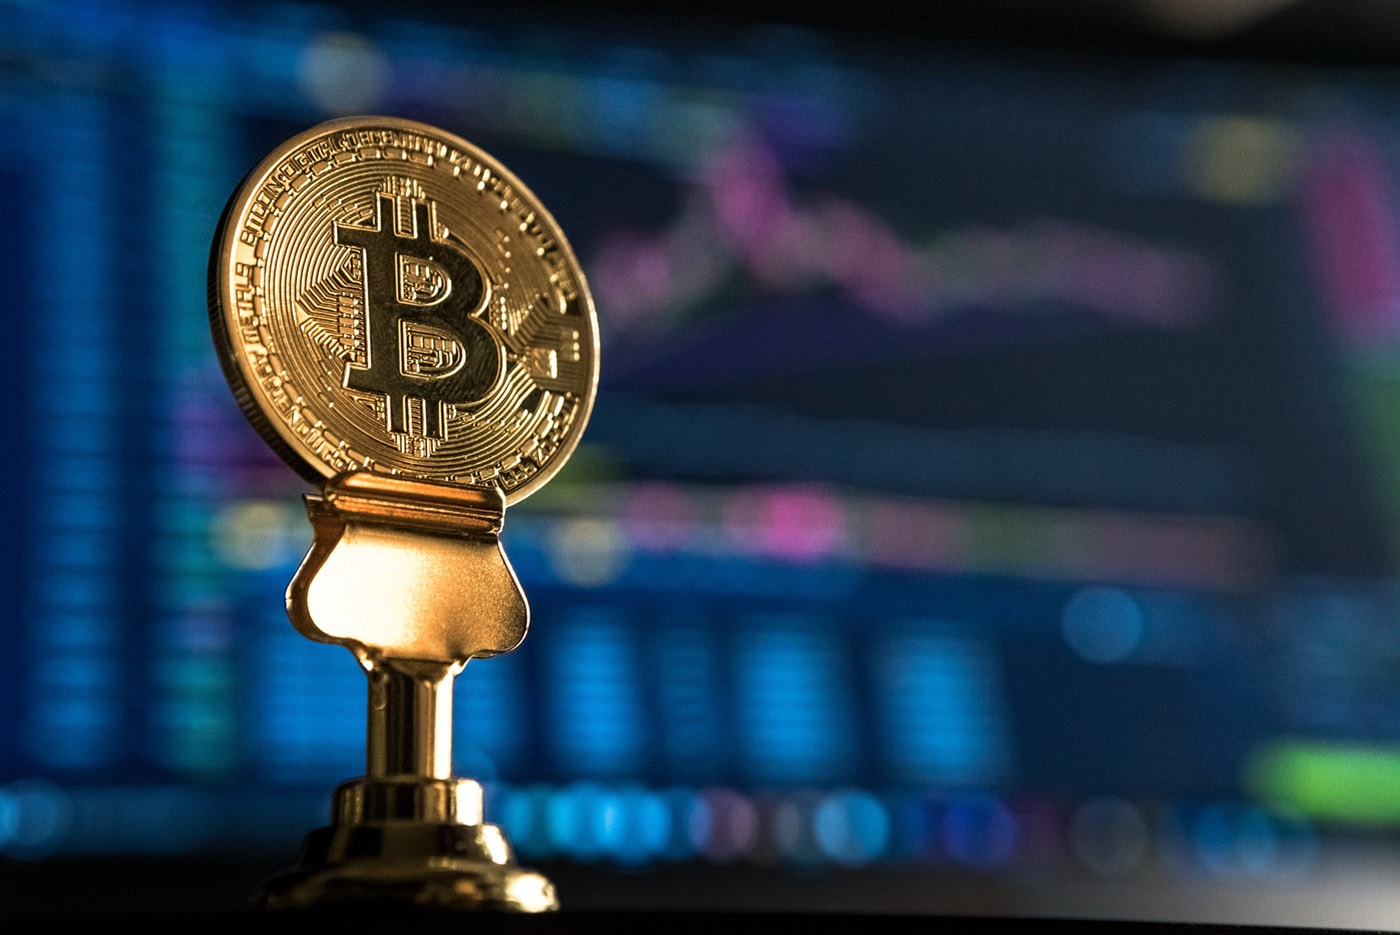 Buy Bitcoin from Coinbase